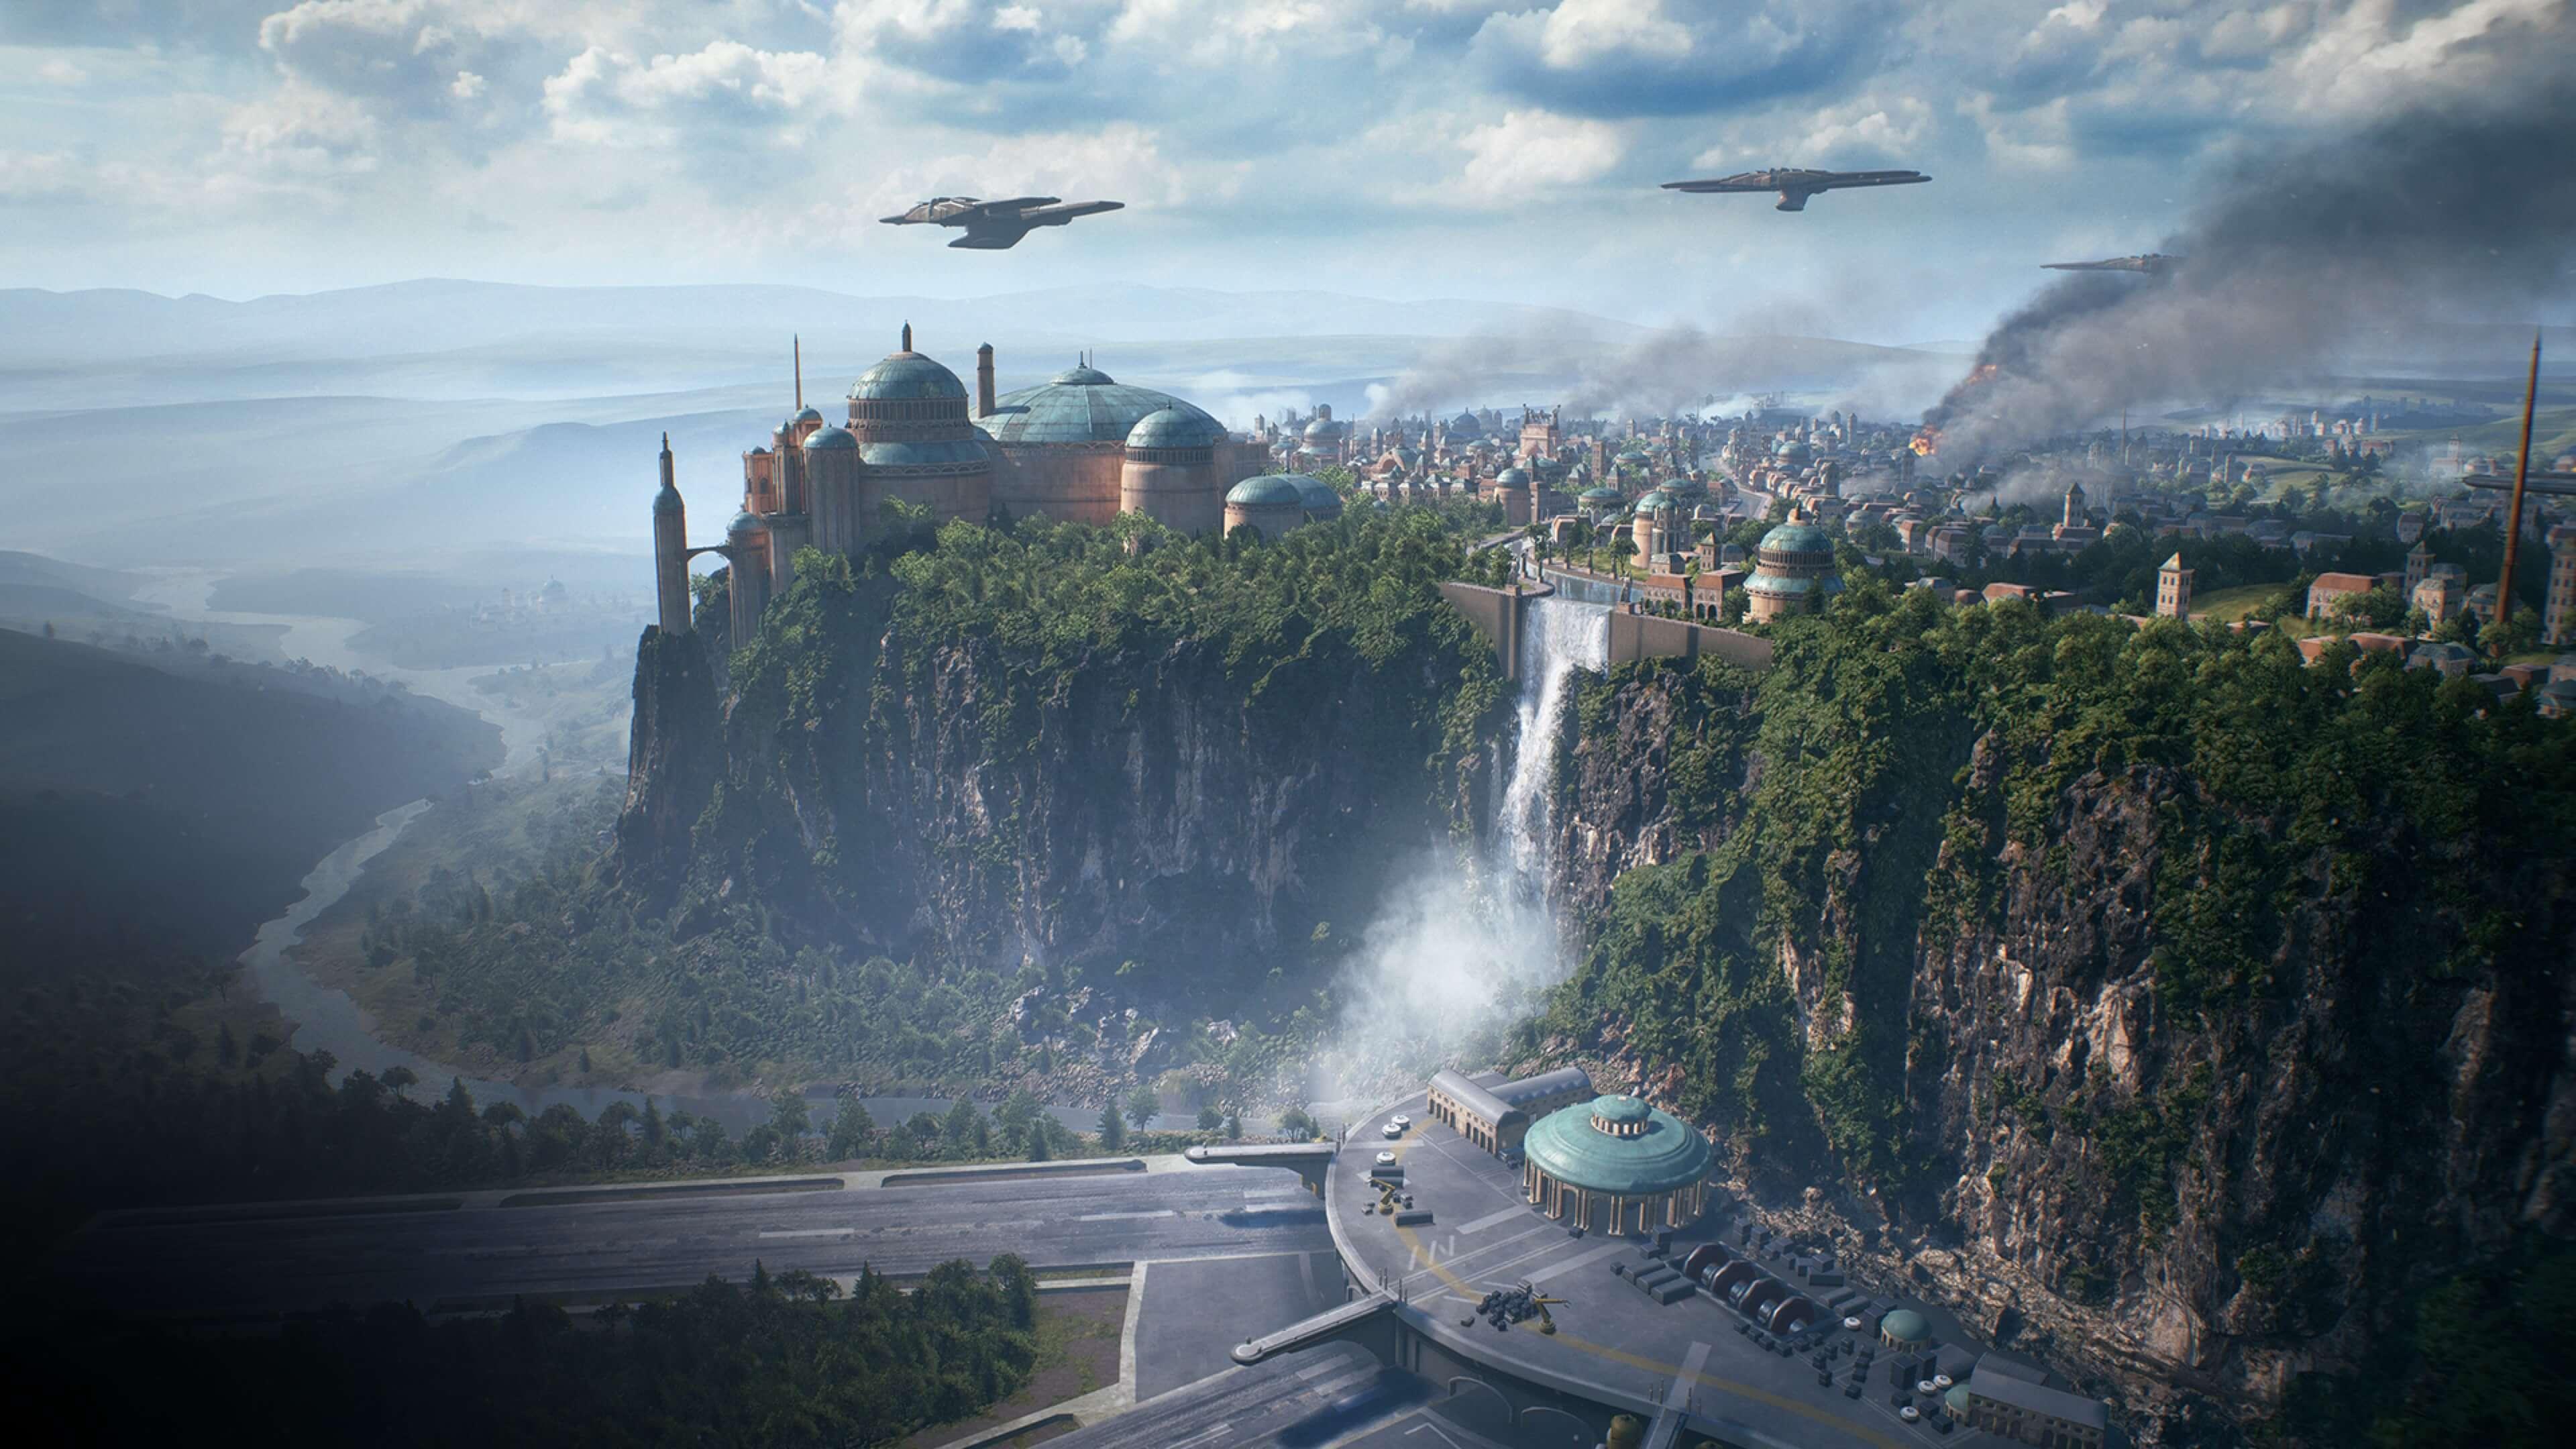 Star Wars Battlefront II 2017 4k Ultra HD Wallpaper Background 3840x2160